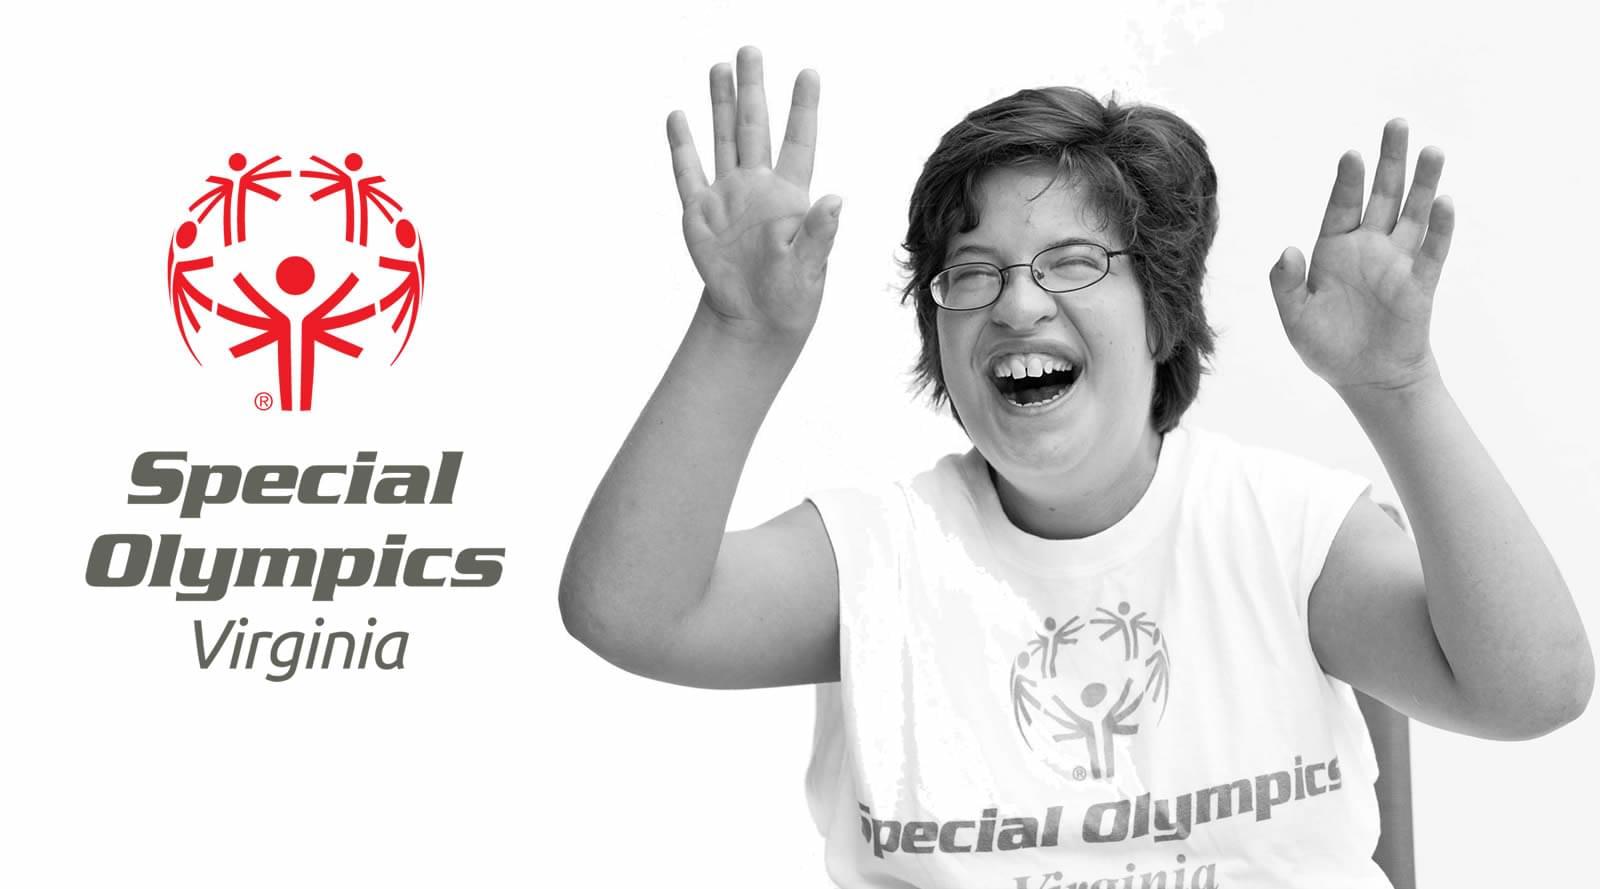 Special Olympics (1/9 – 1/11)